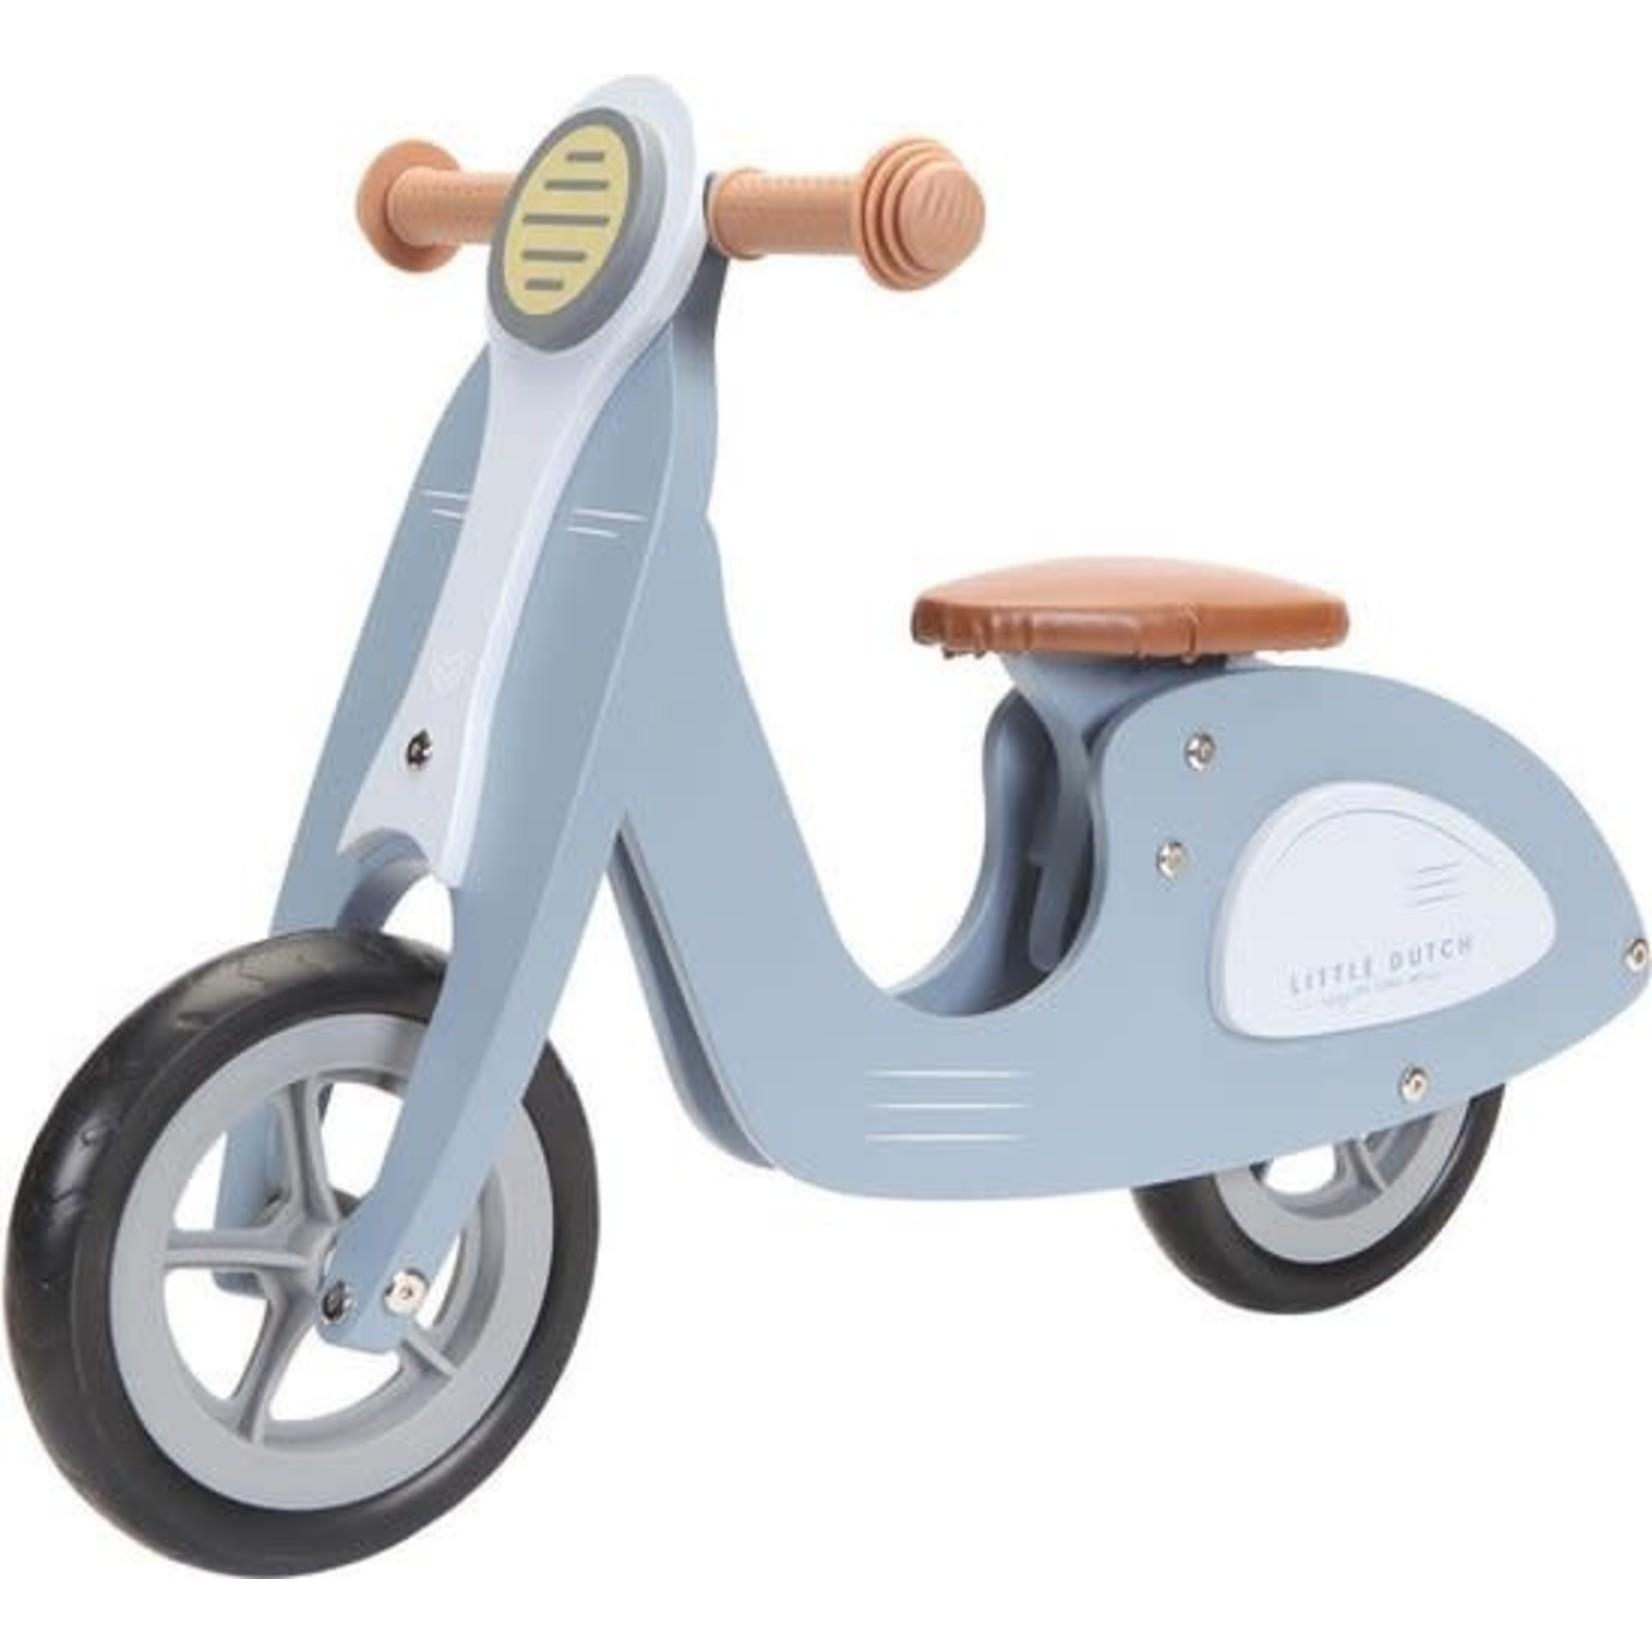 Little Dutch Loopscooter blue